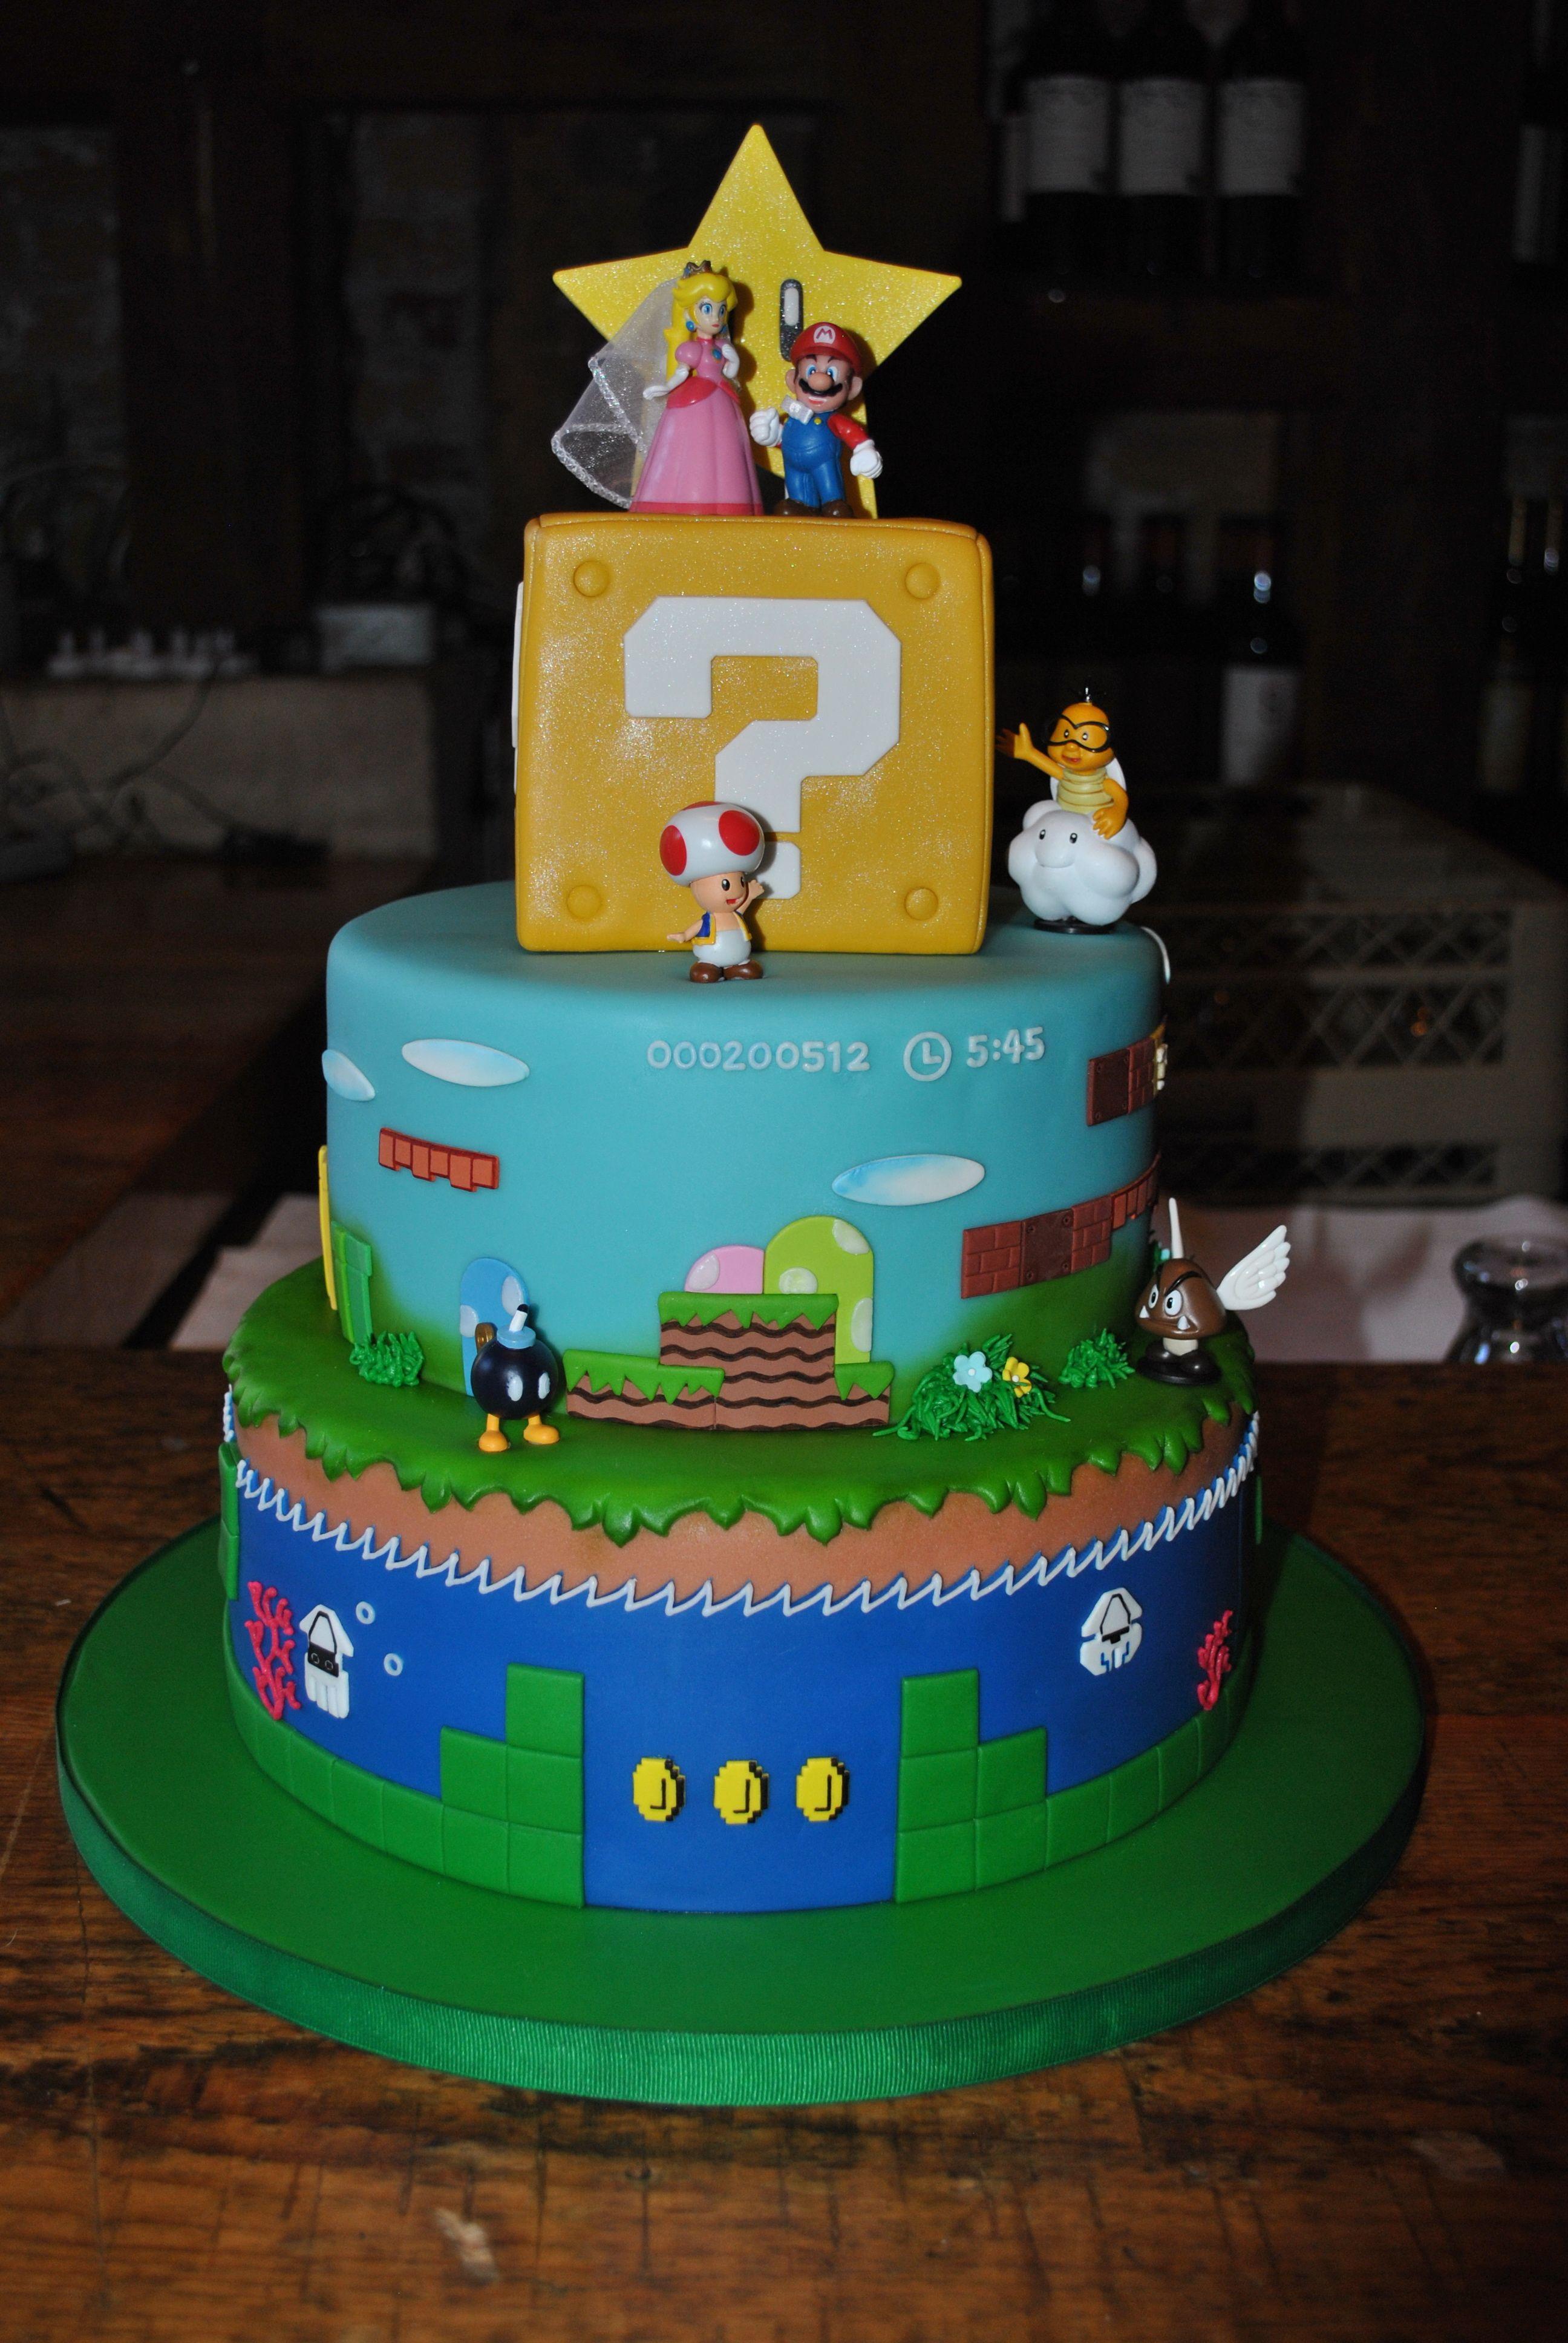 Super Mario Wedding Cake My Lil 39 Cakery Pinterest Mario And Weddin